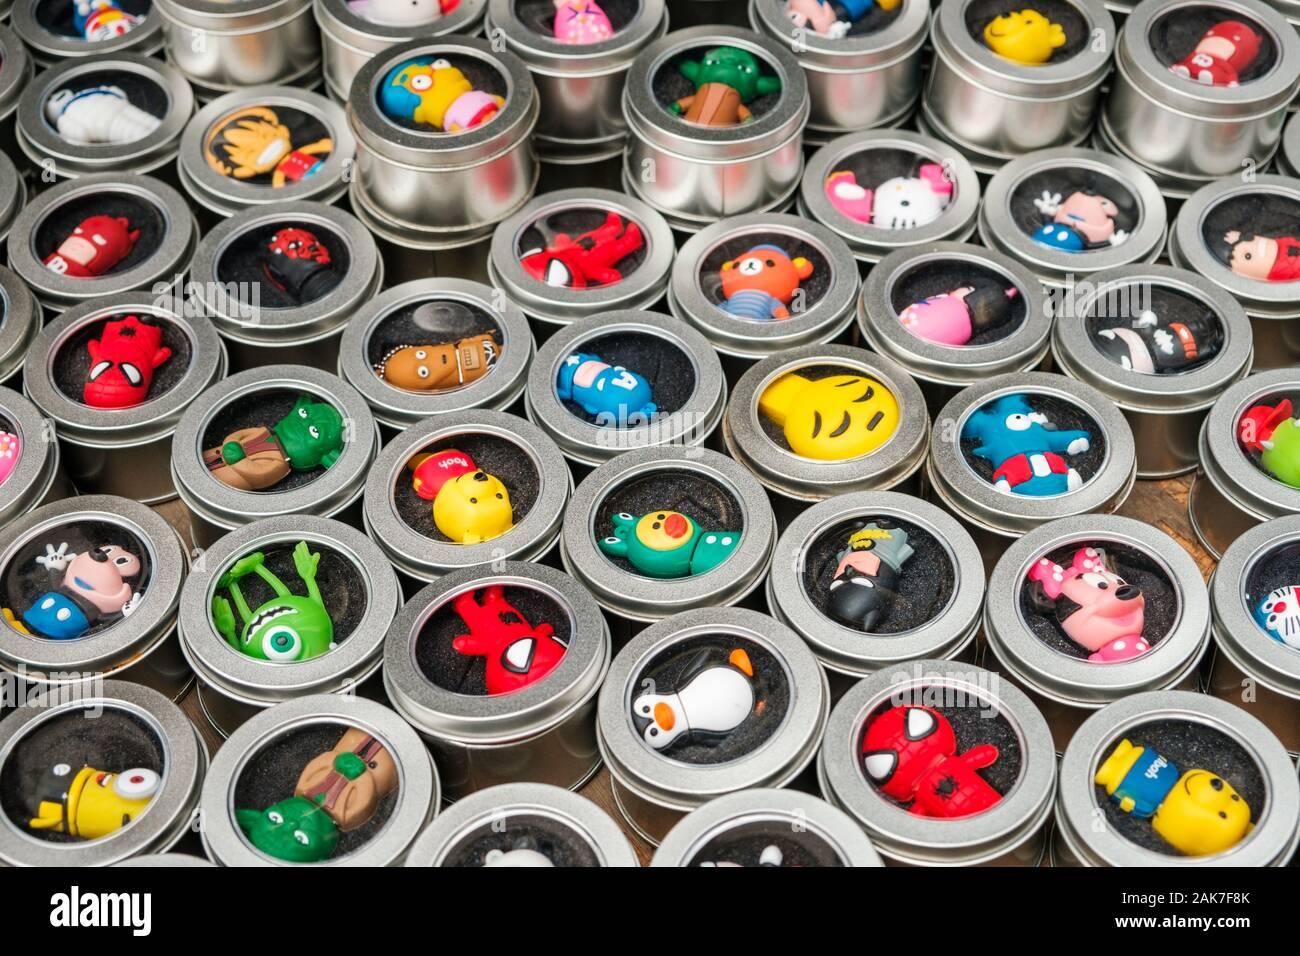 HongKong, China - November, 2019: USB-Stick mit Spielzeug/Cartoon/Comic Charaktere auf Street Market (Markt) Ladie's in Hongkong, Tung Choi Street Stockfoto